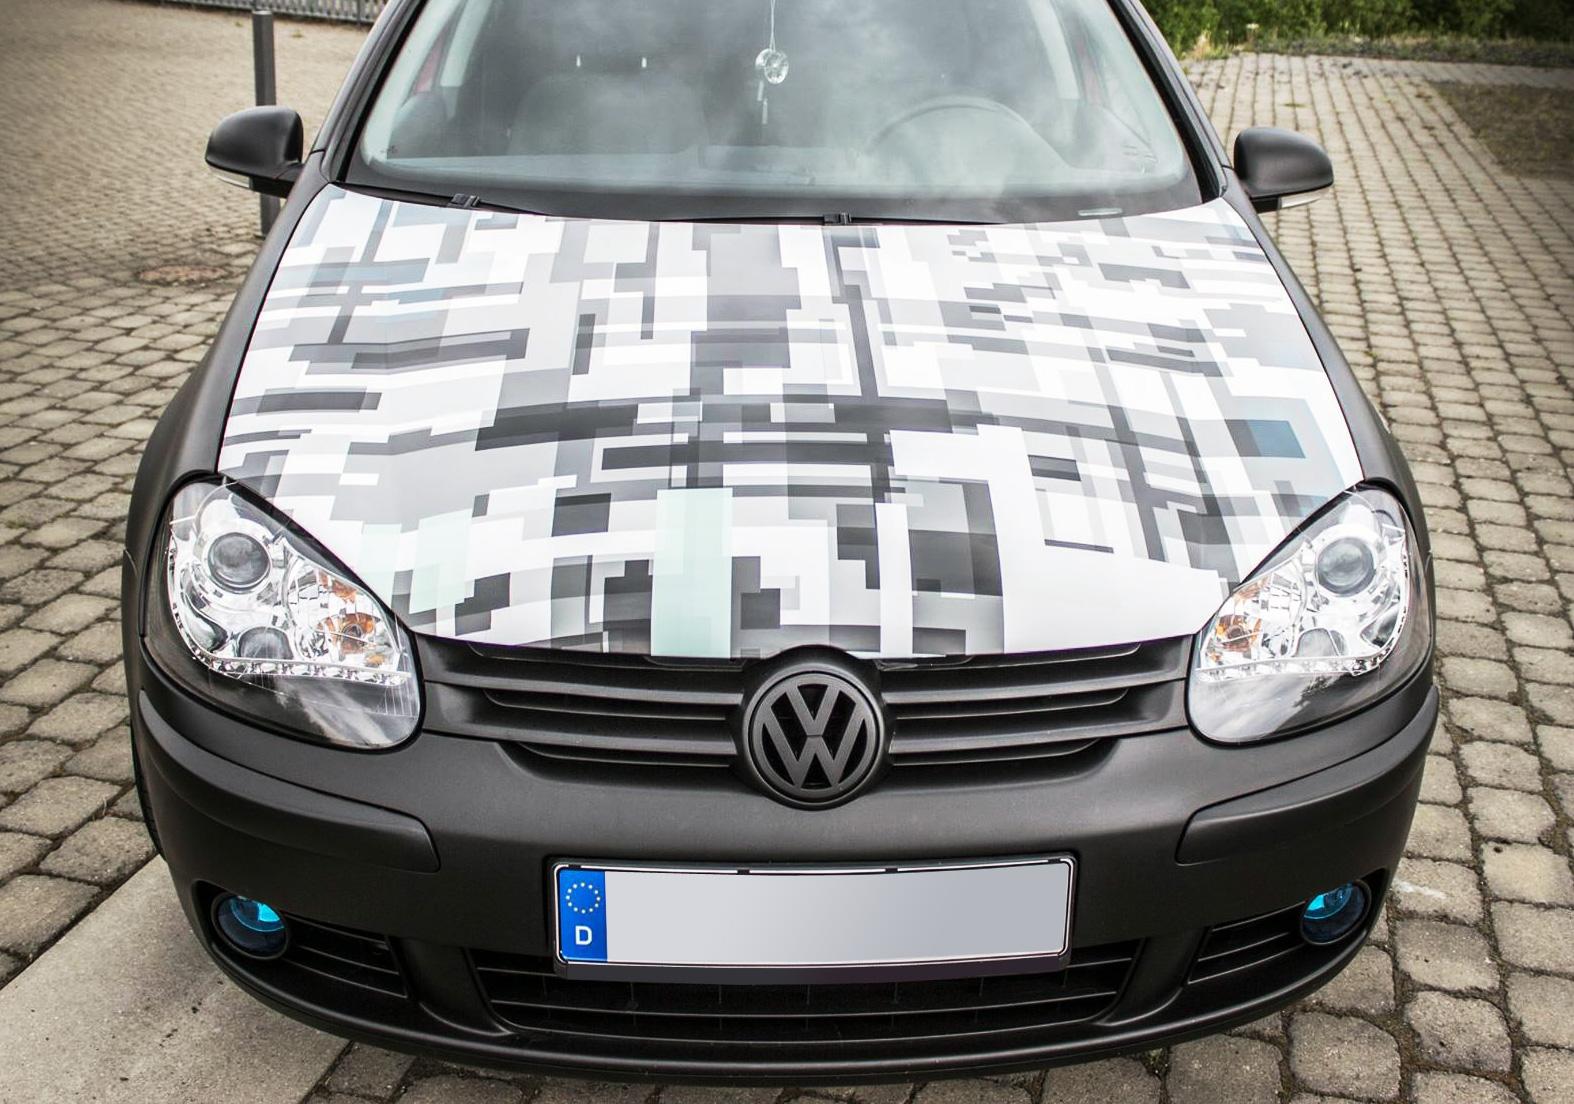 camouflage folie technic aufkleber pixel tuning car. Black Bedroom Furniture Sets. Home Design Ideas